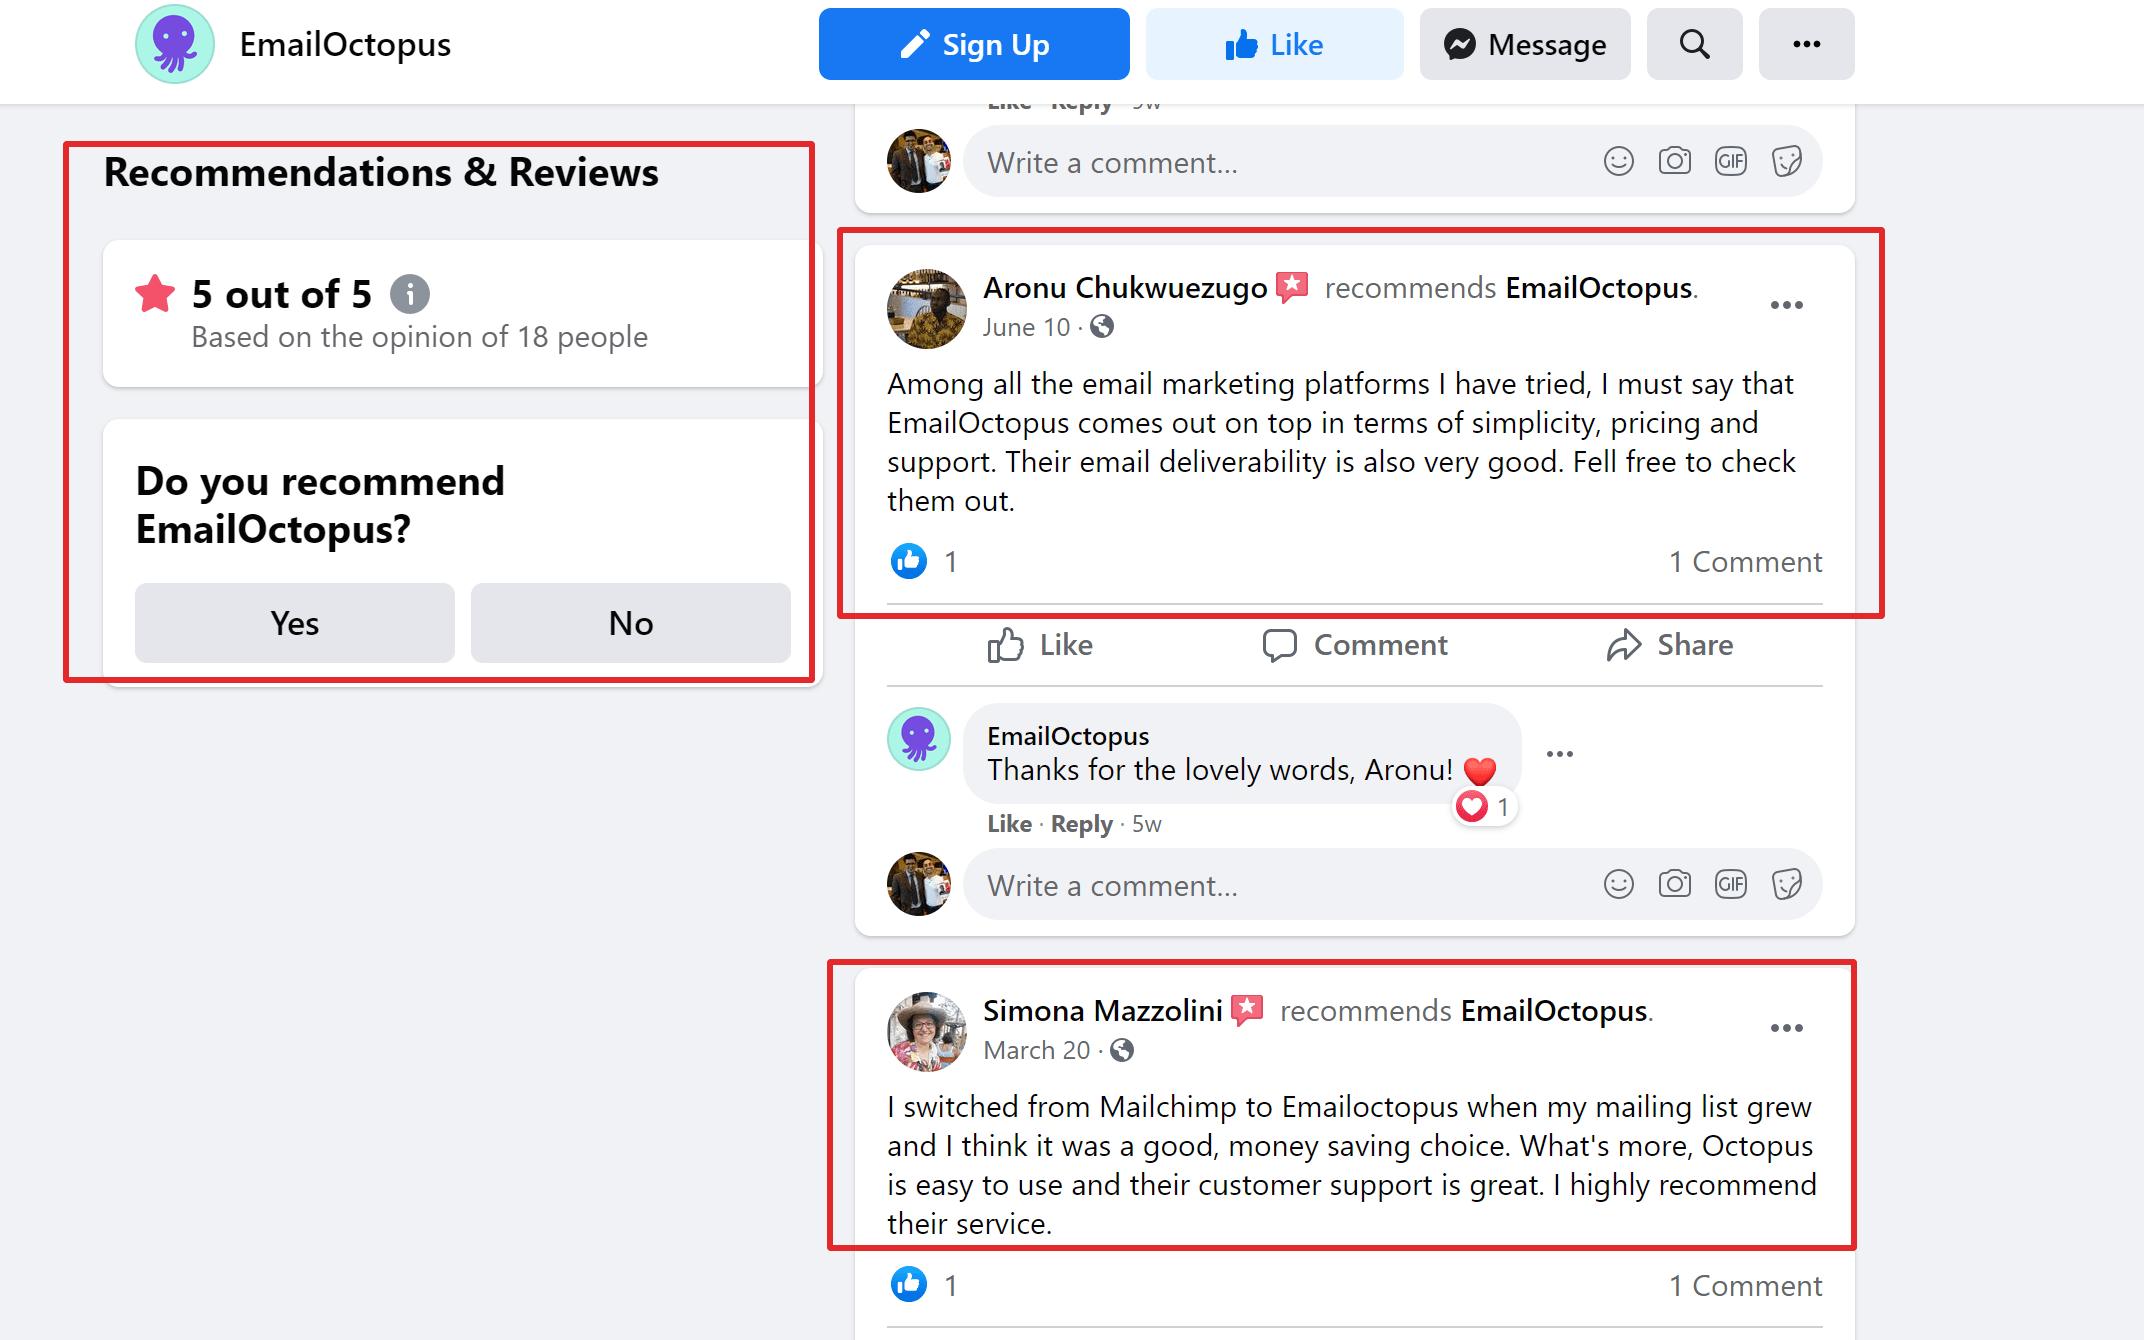 Emailoctopus reviews